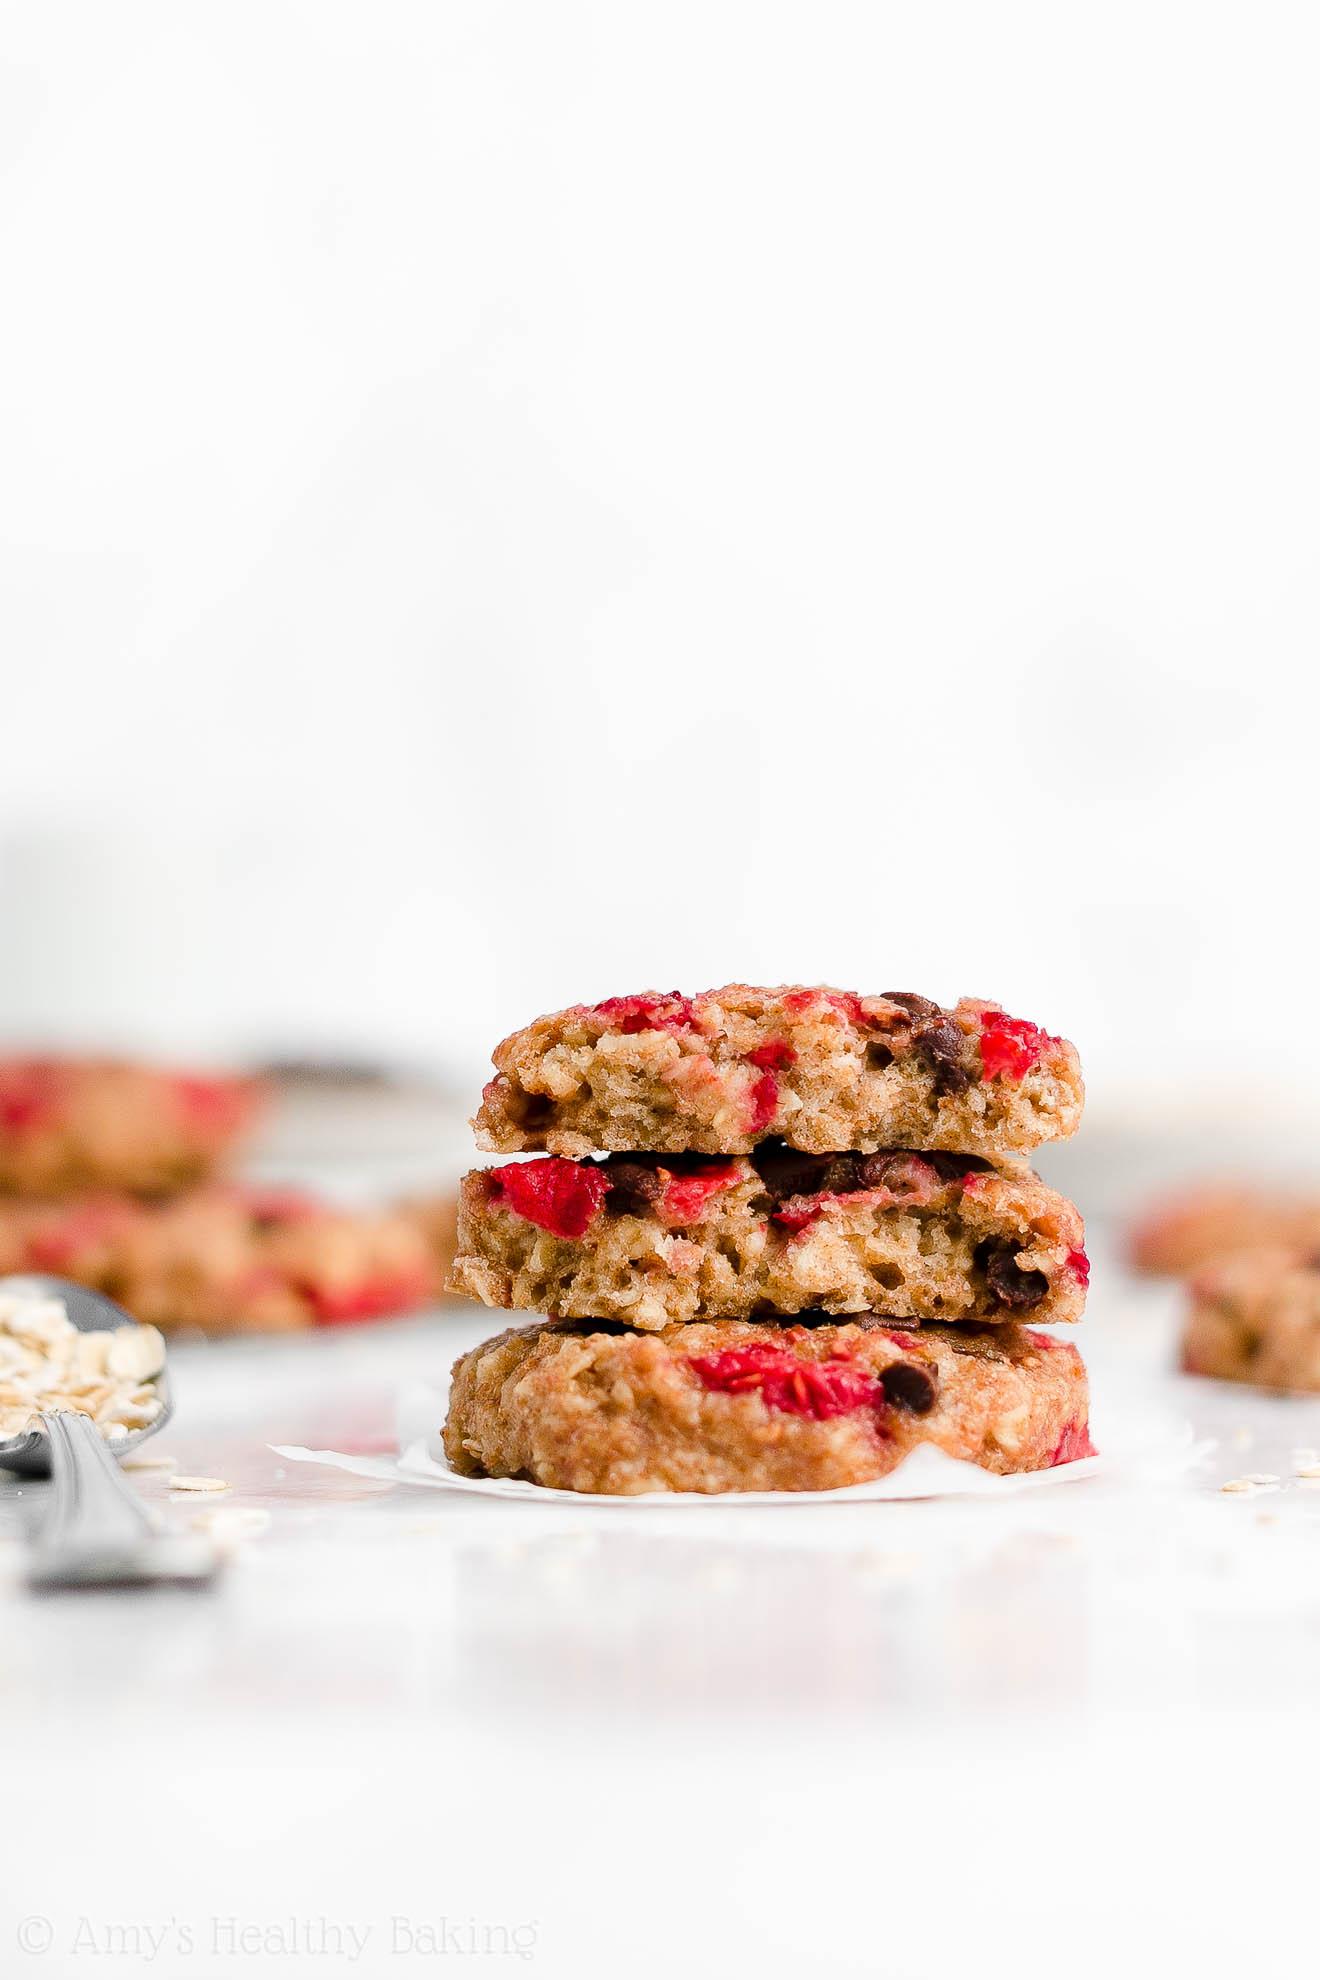 Easy Healthy Homemade Raspberry Chocolate Chip Oatmeal Breakfast Cookies